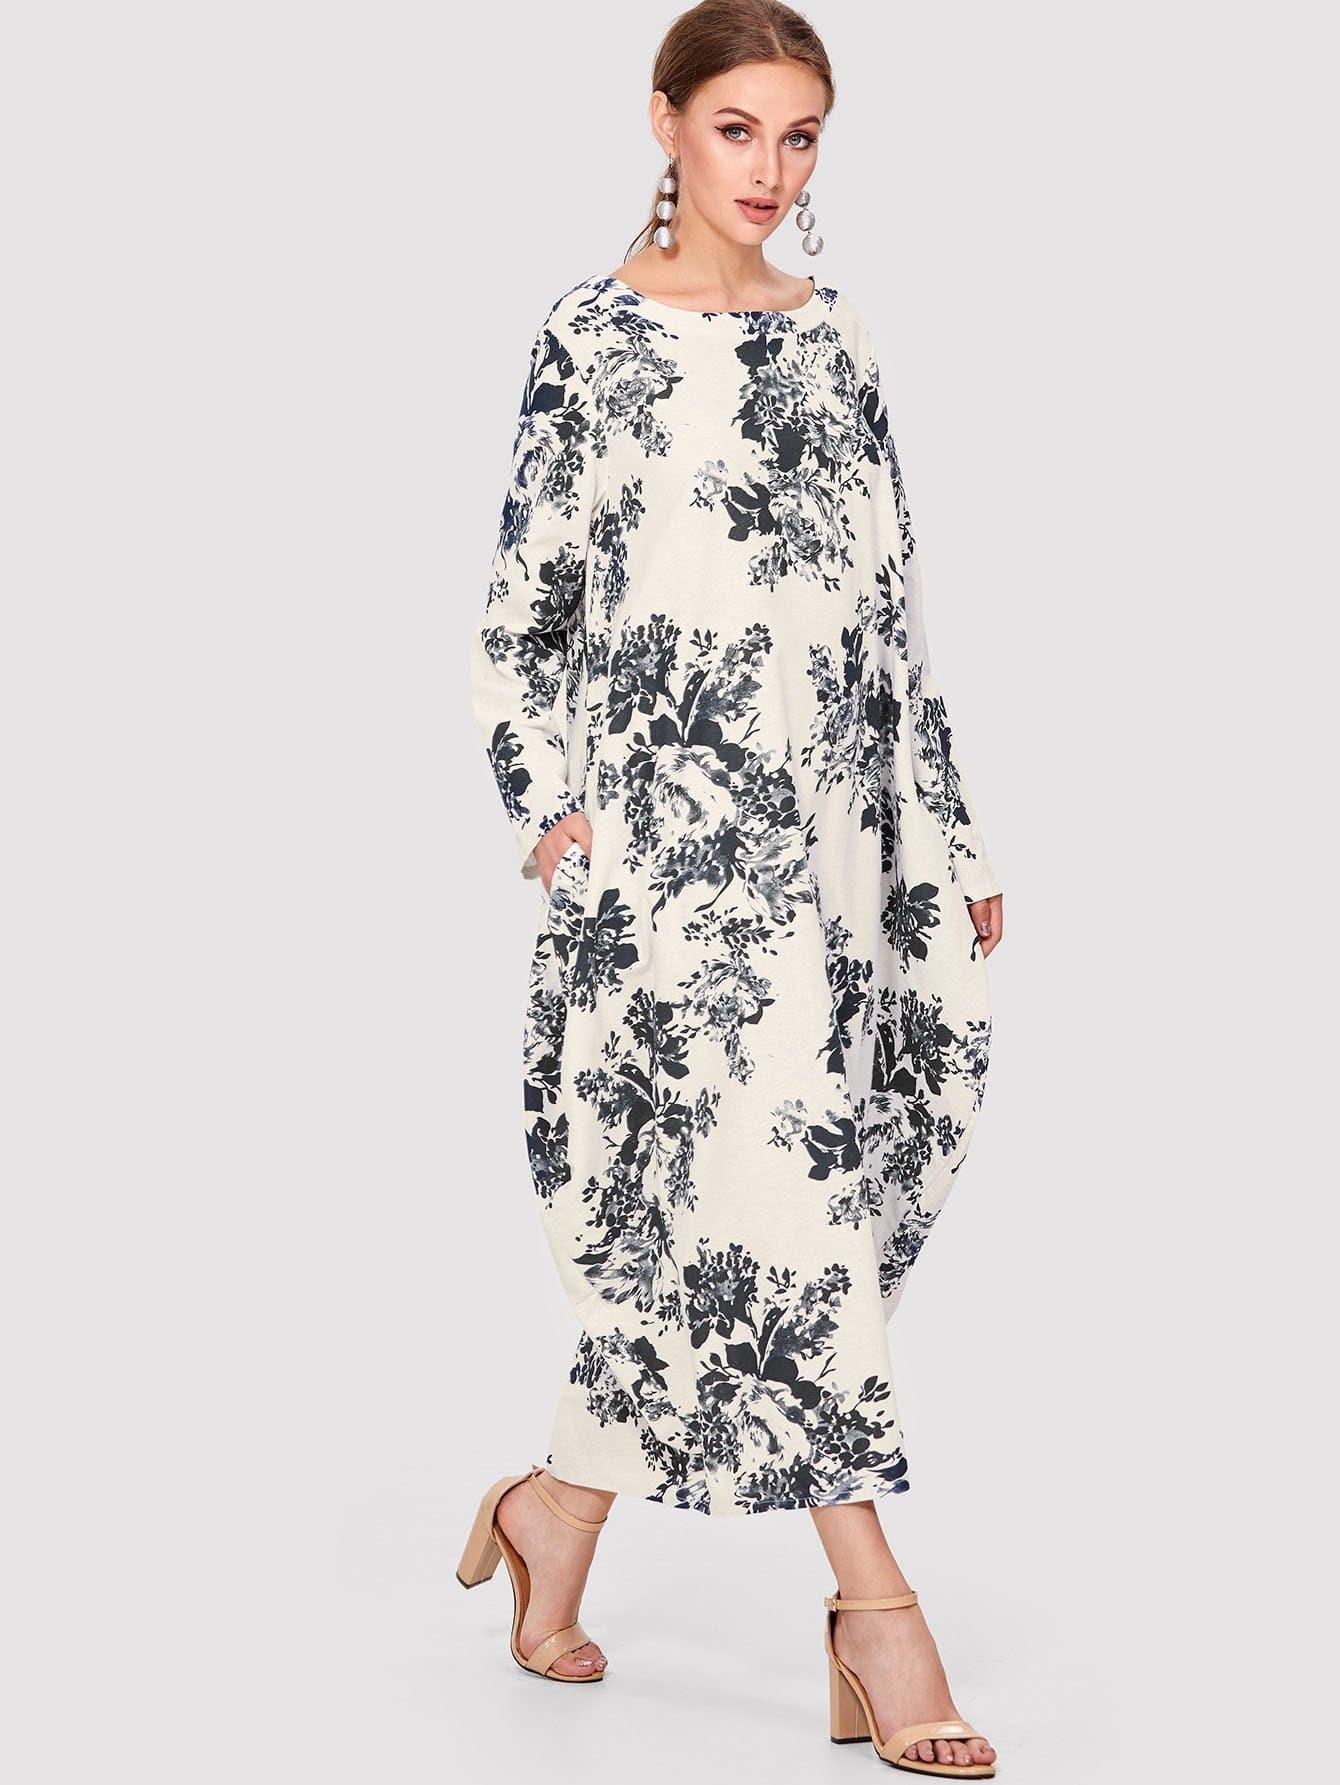 Botanical Print Longline Dress landscape print longline dress